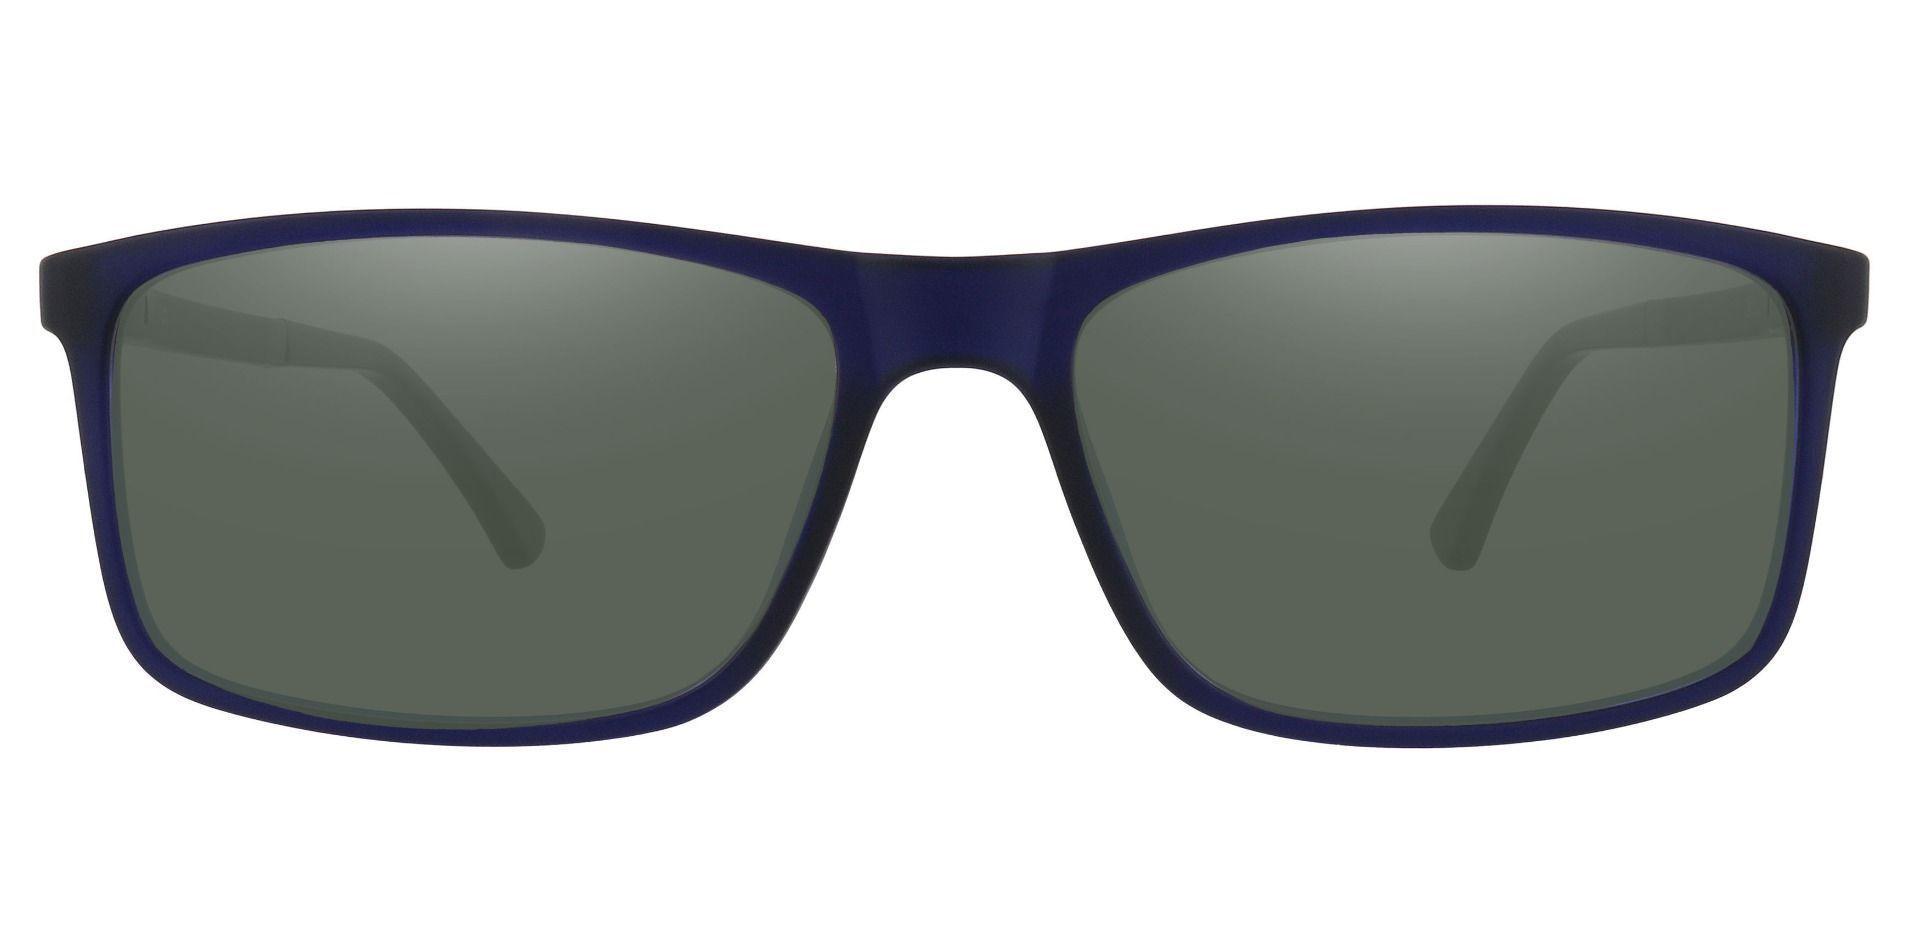 Montana Rectangle Prescription Sunglasses - Blue Frame With Green Lenses